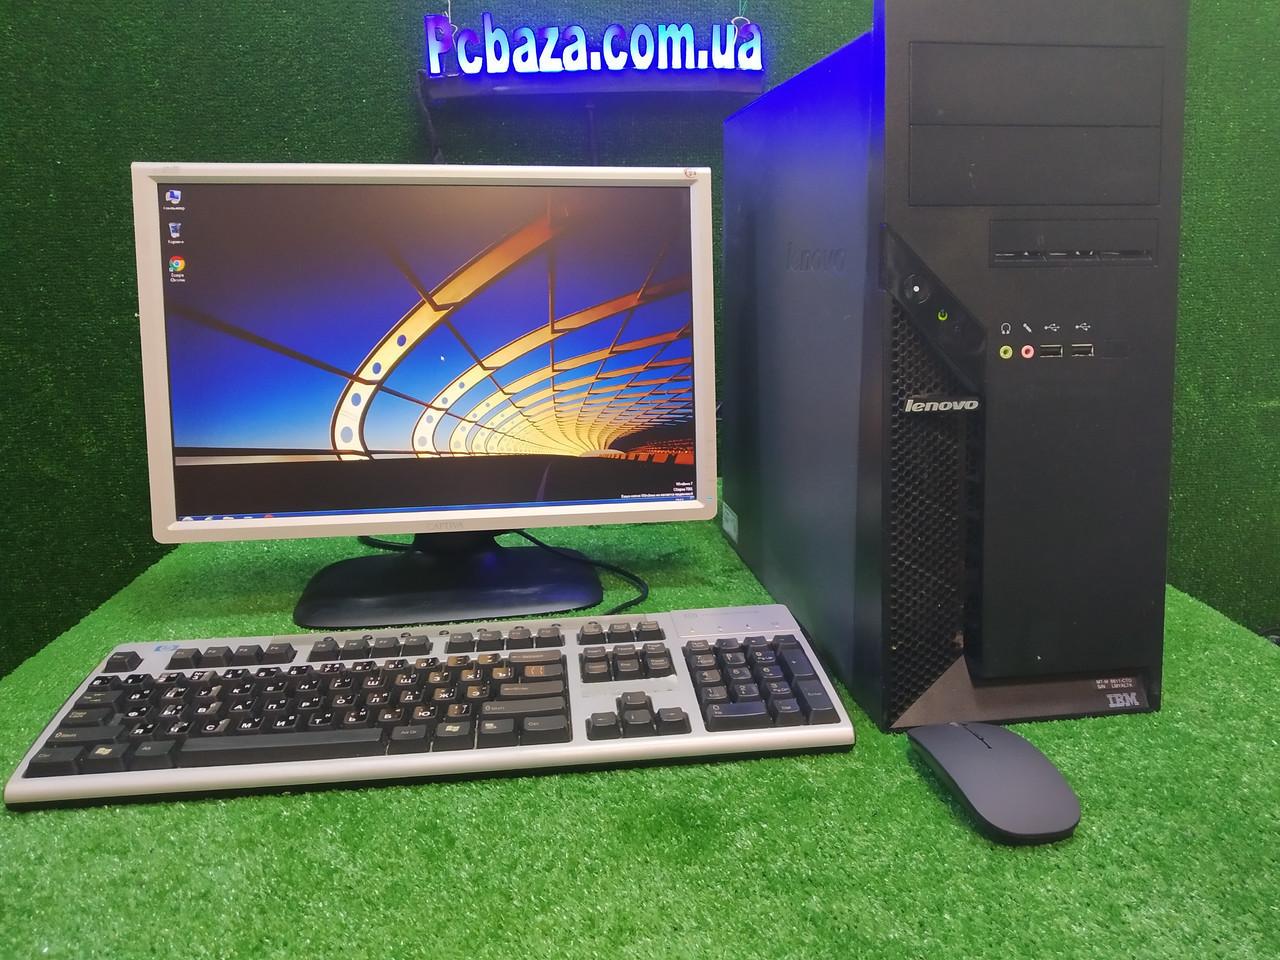 "Комплект Lenovo M55, 4 ядра, 4 ГБ ОЗУ, 500 Гб HDD + монитор 19"" Широкий , Полностью настроен!"